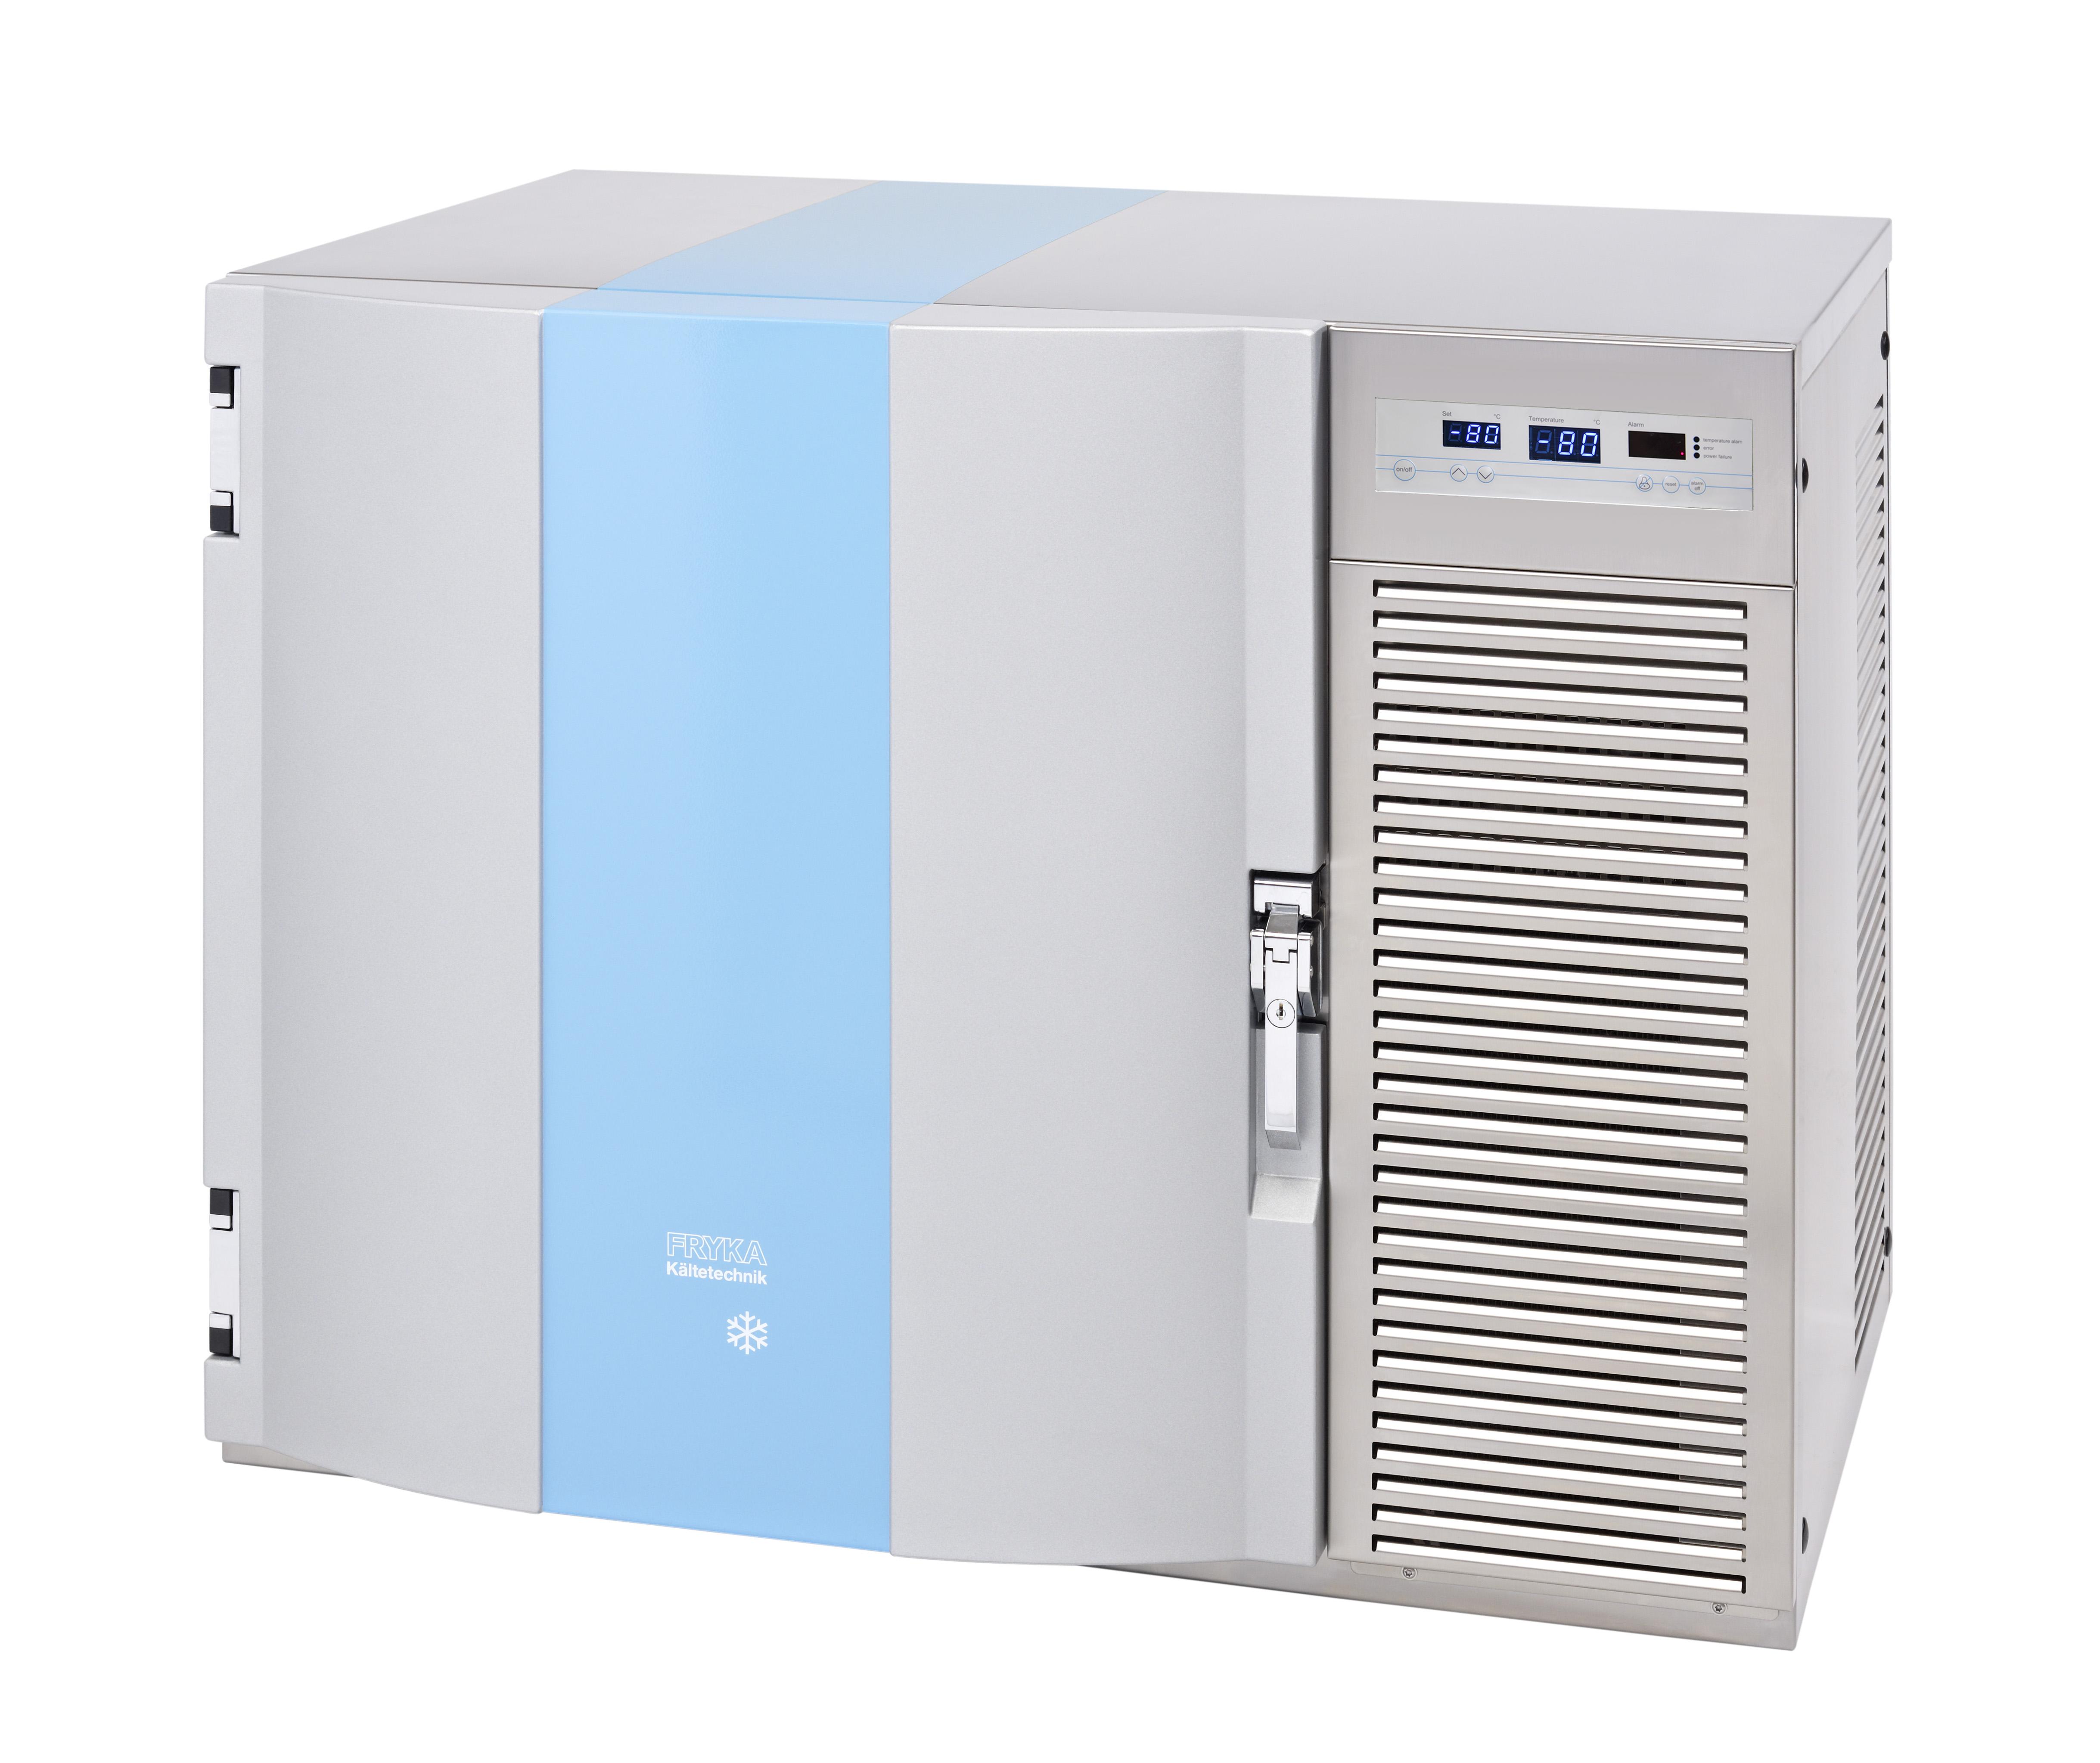 FRYKA Tiefkühlbox TUS 50-100 (-10?C bis -50?C)